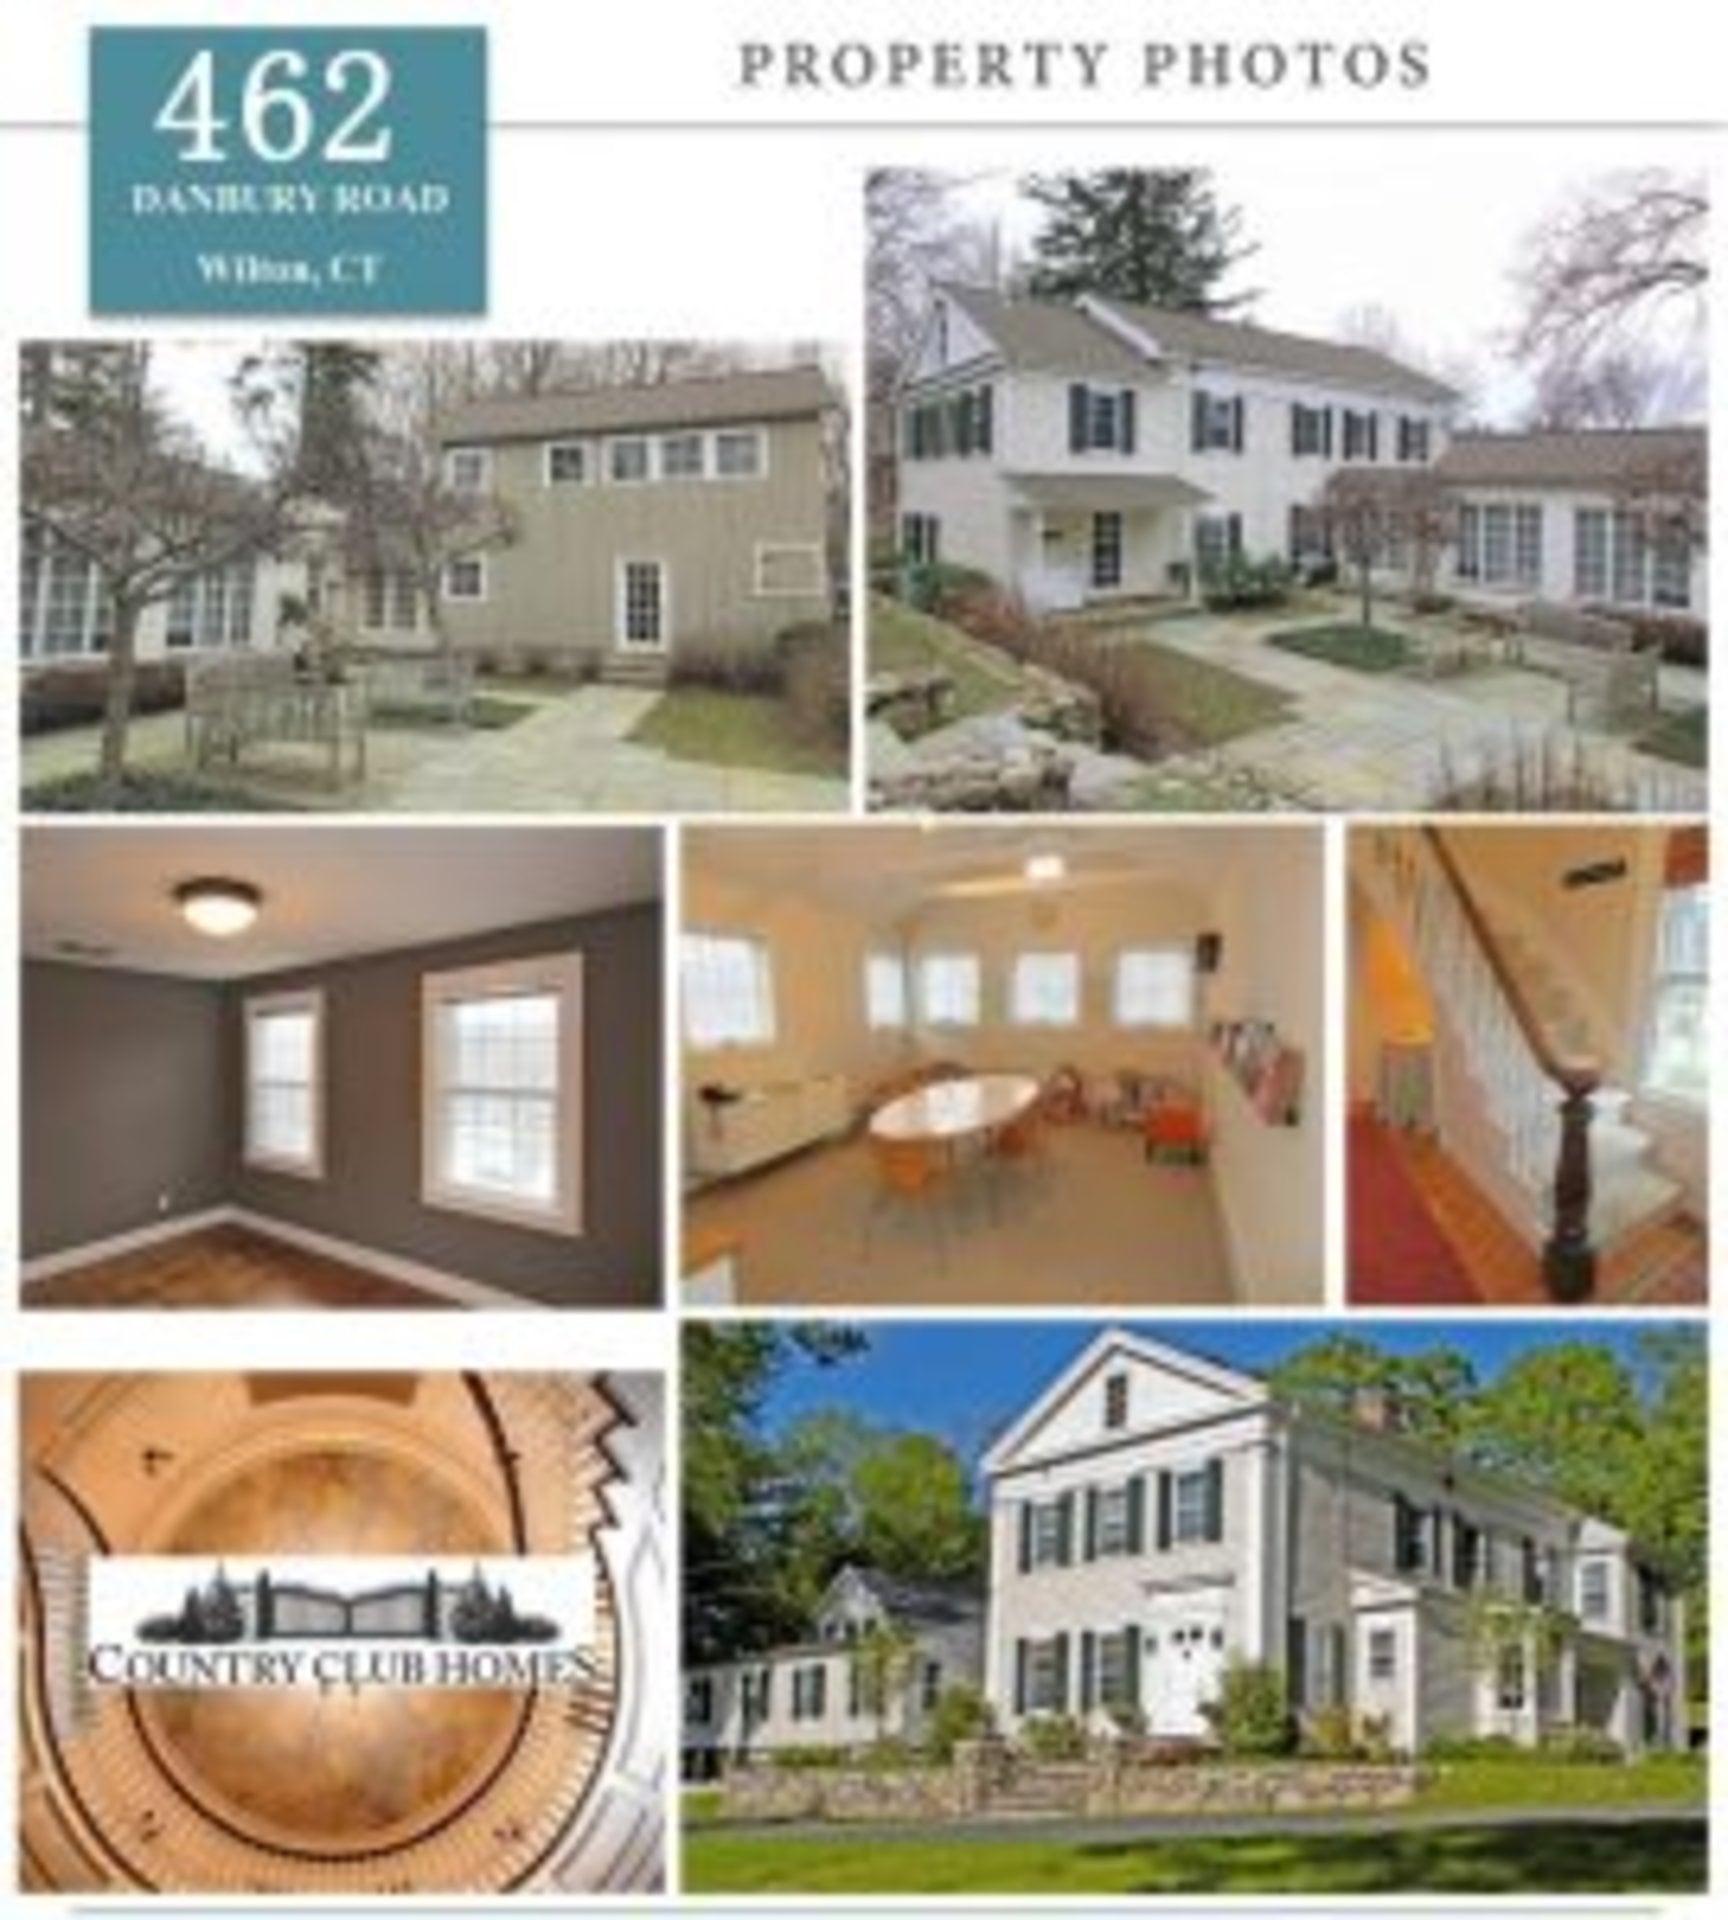 Investment Opportunity: 462 Danbury Road, Wilton, Connecticut